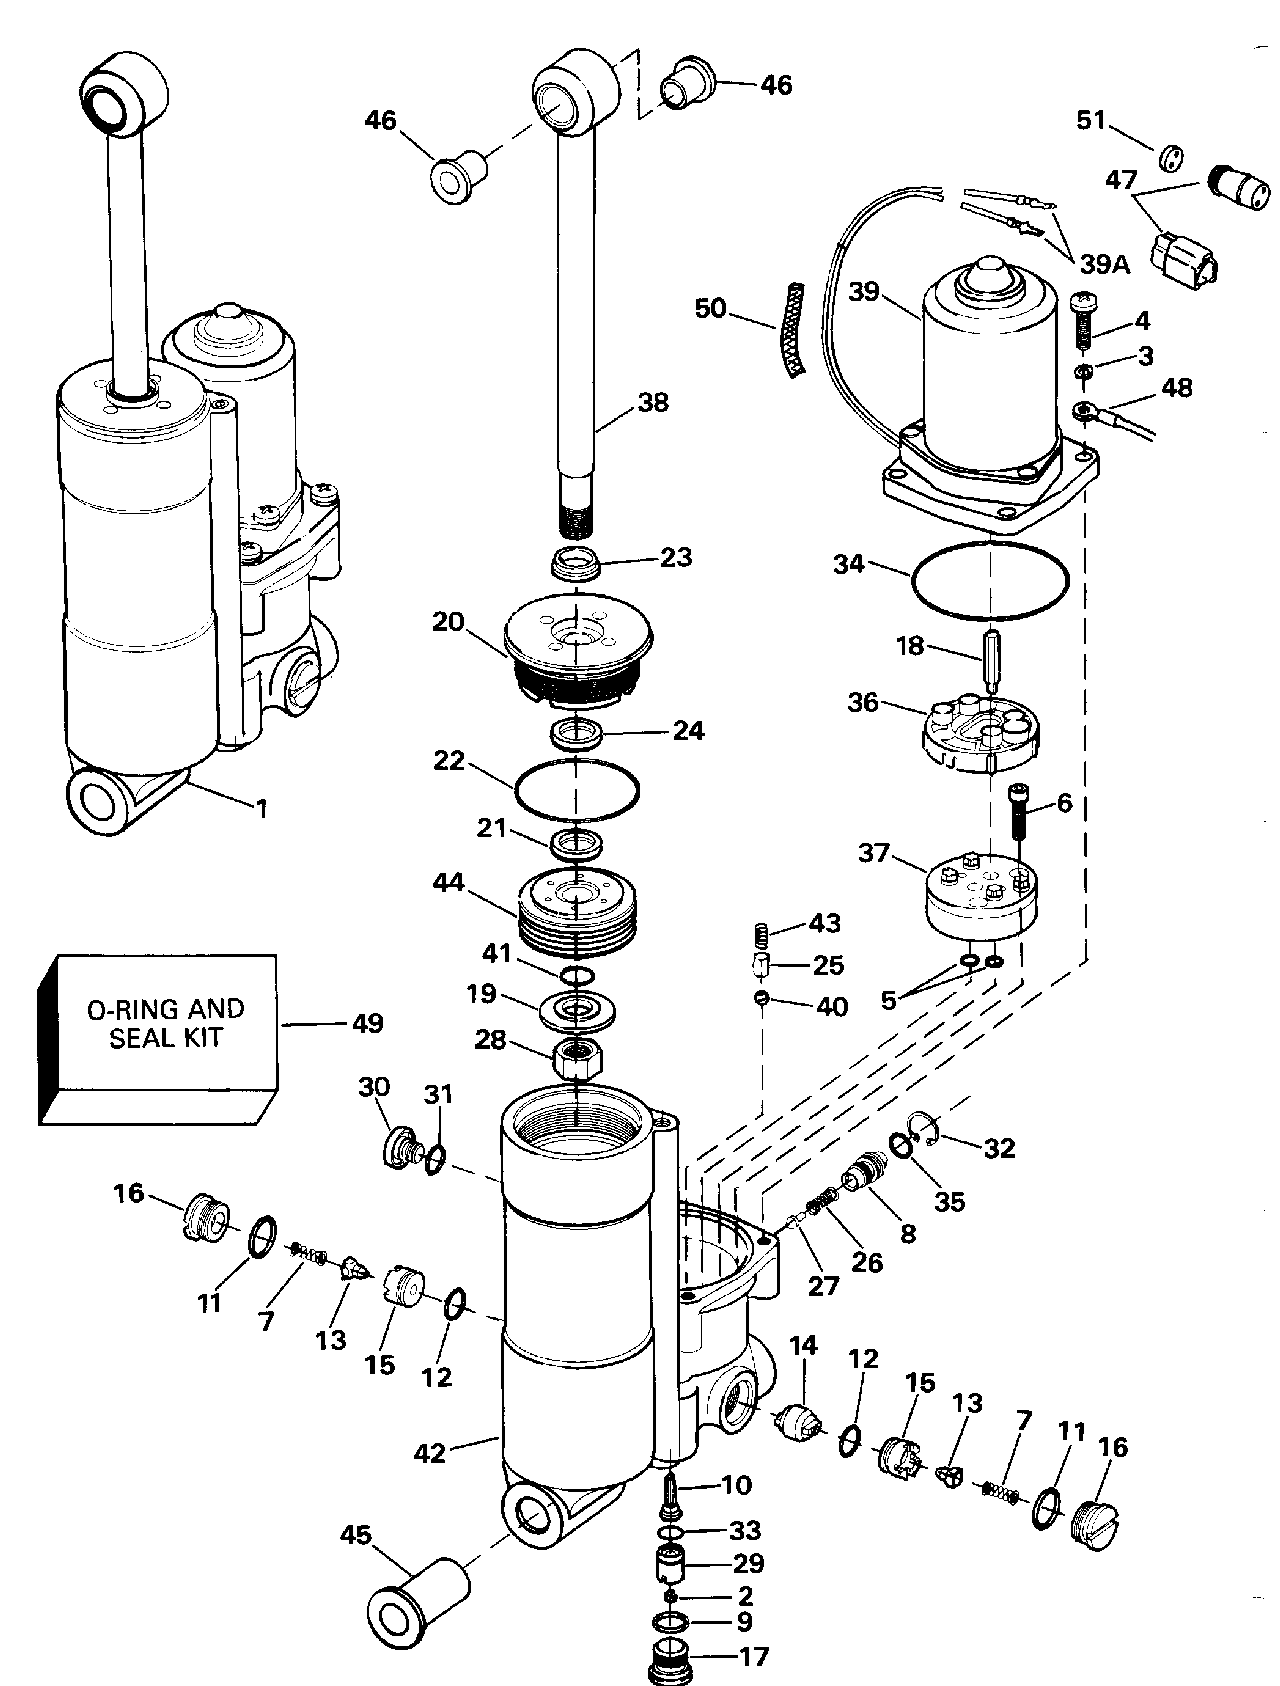 Suzuki dt85 outboard manual